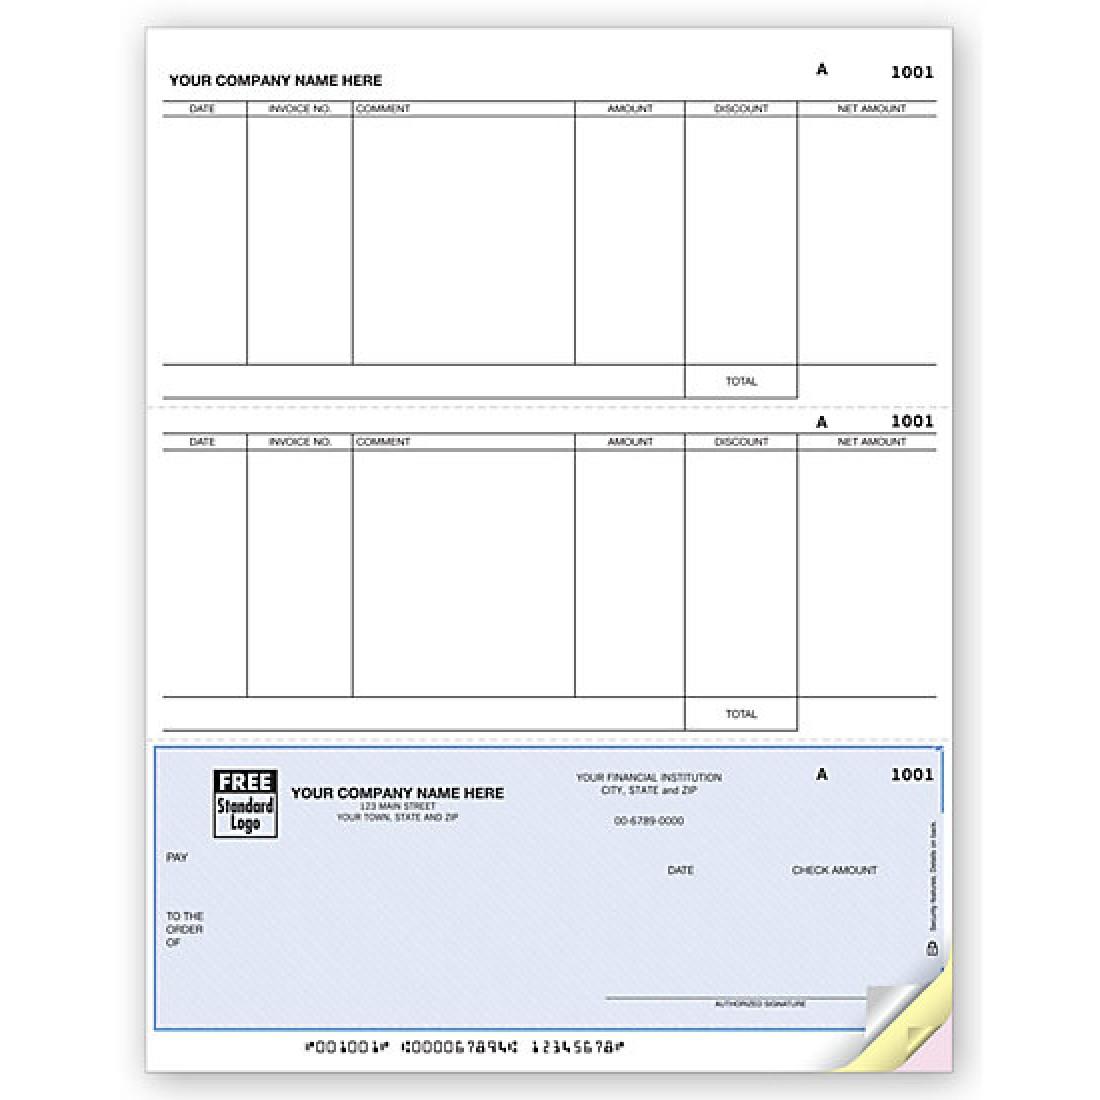 Laser Bottom Accounts Payable Check